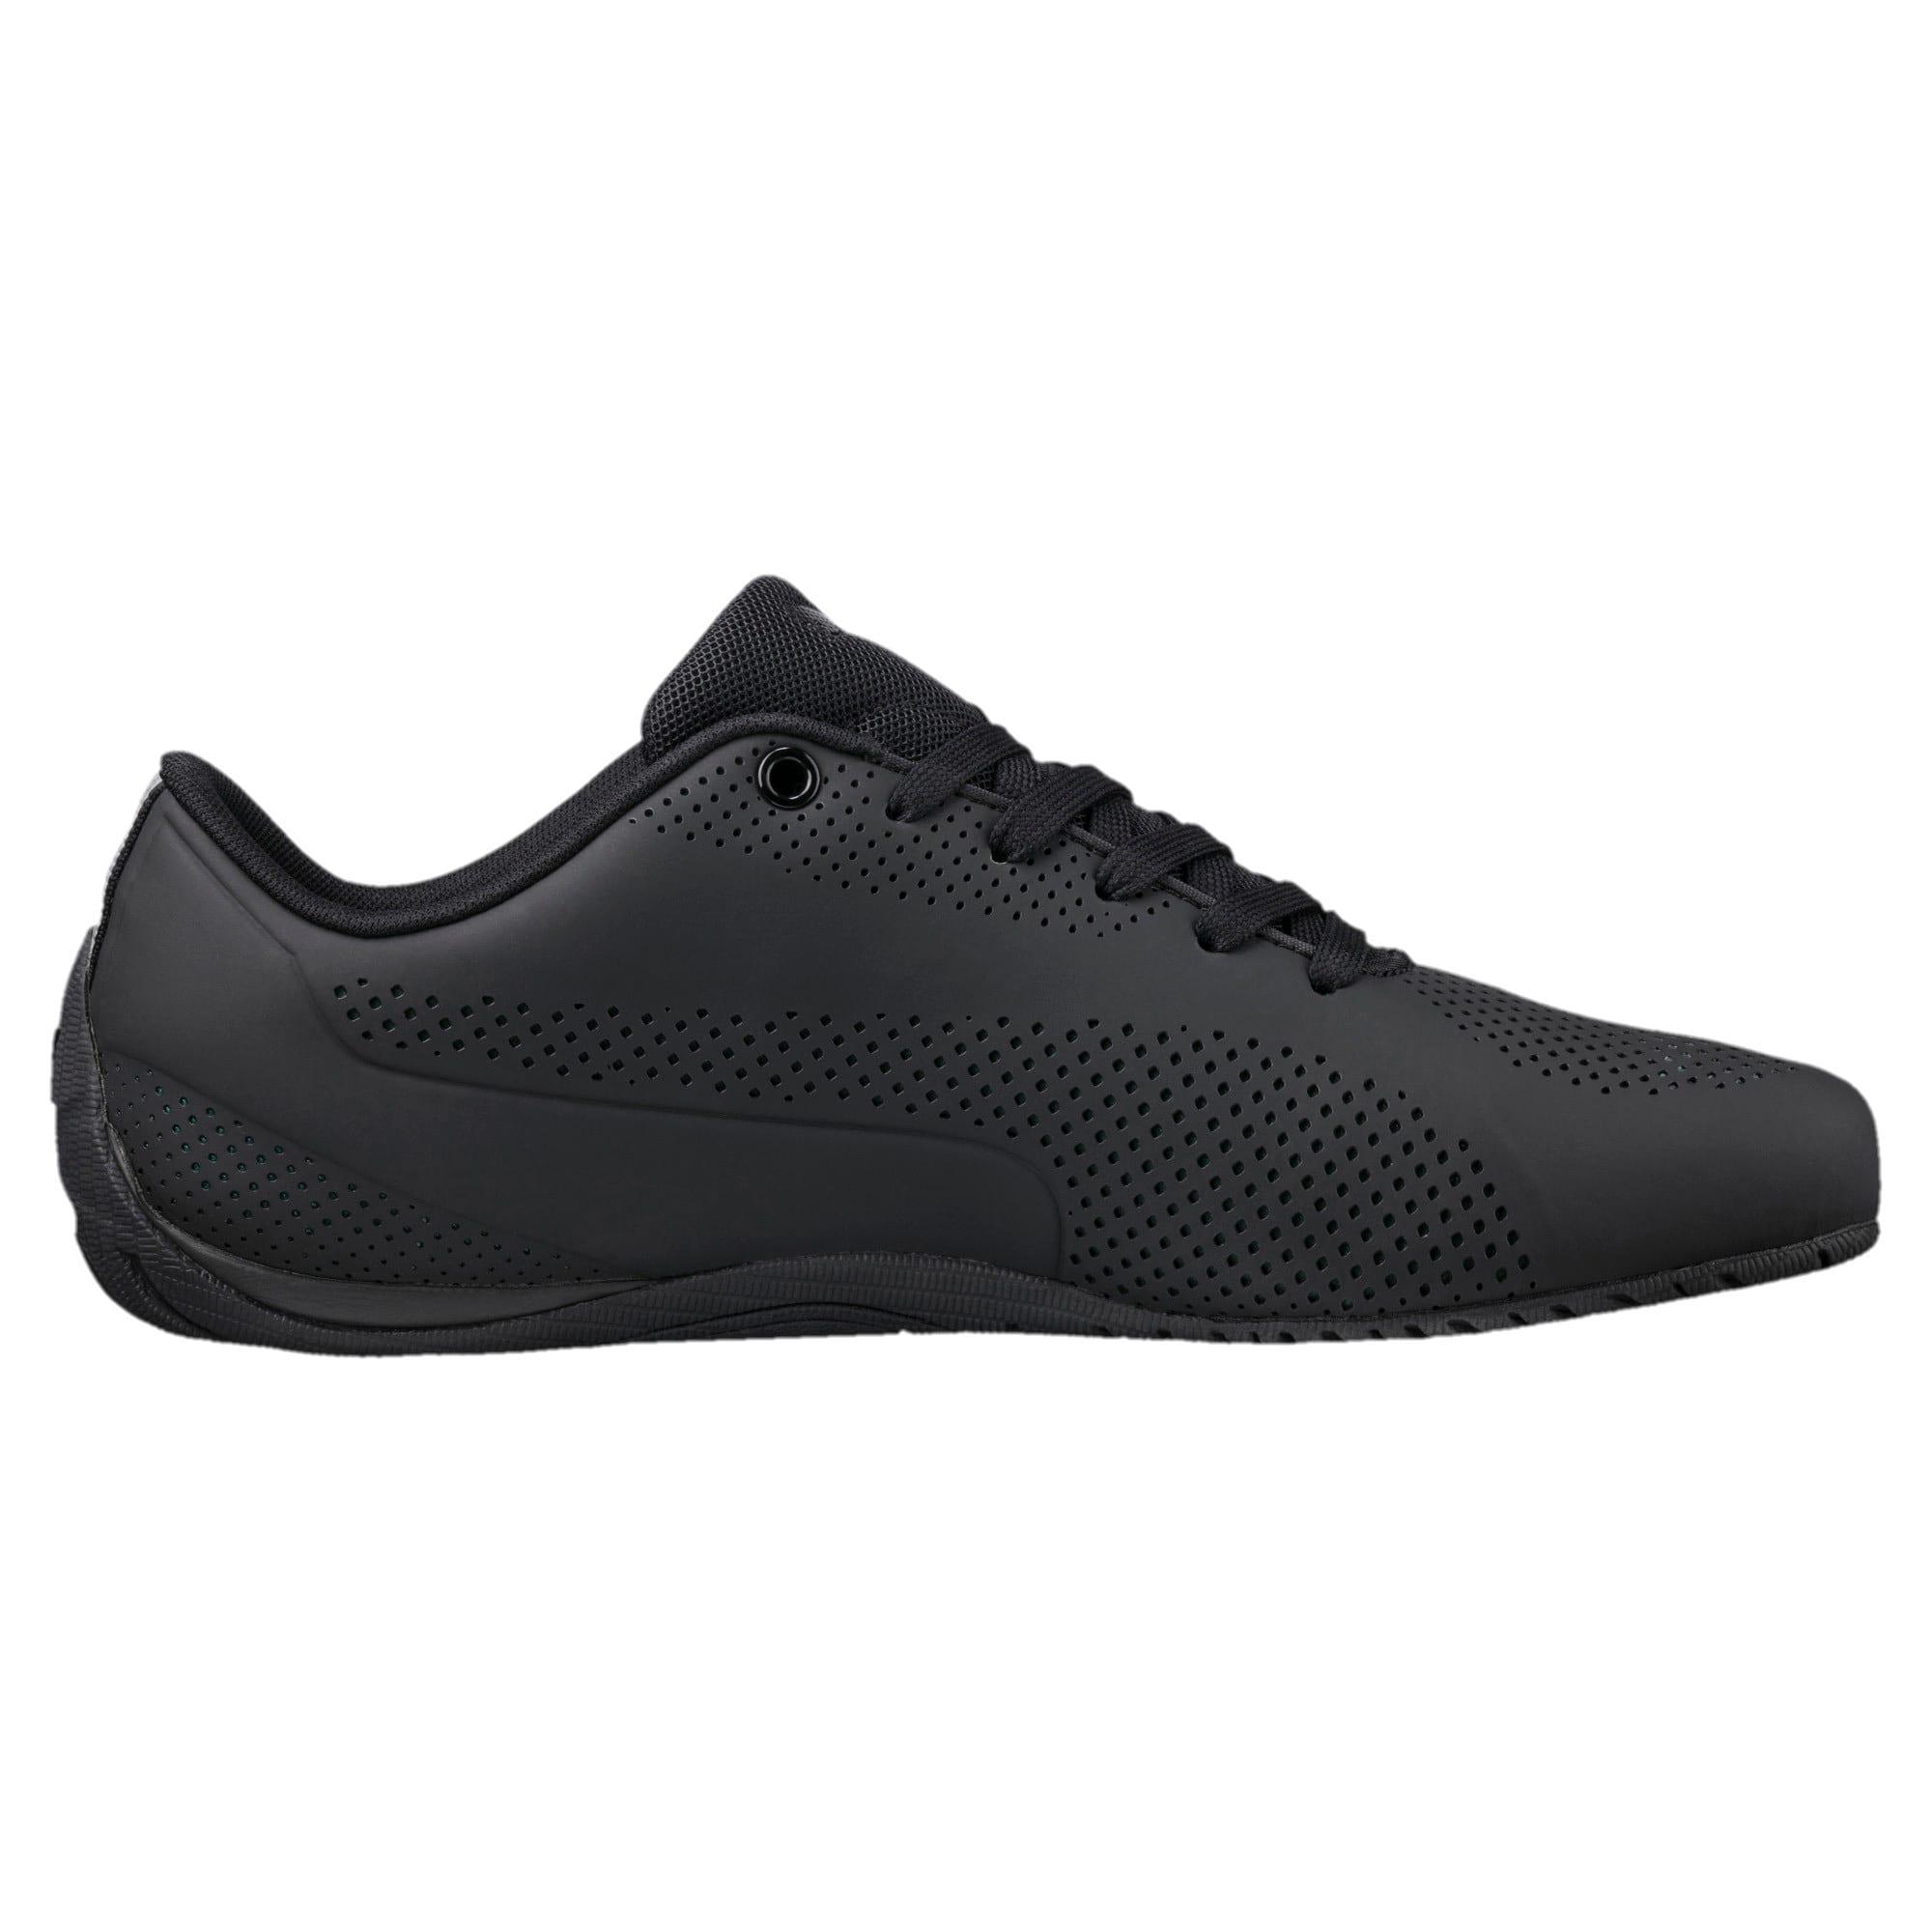 Thumbnail 3 of Drift Cat Ultra Reflective Shoes, Puma Black-Puma Black-Blk, medium